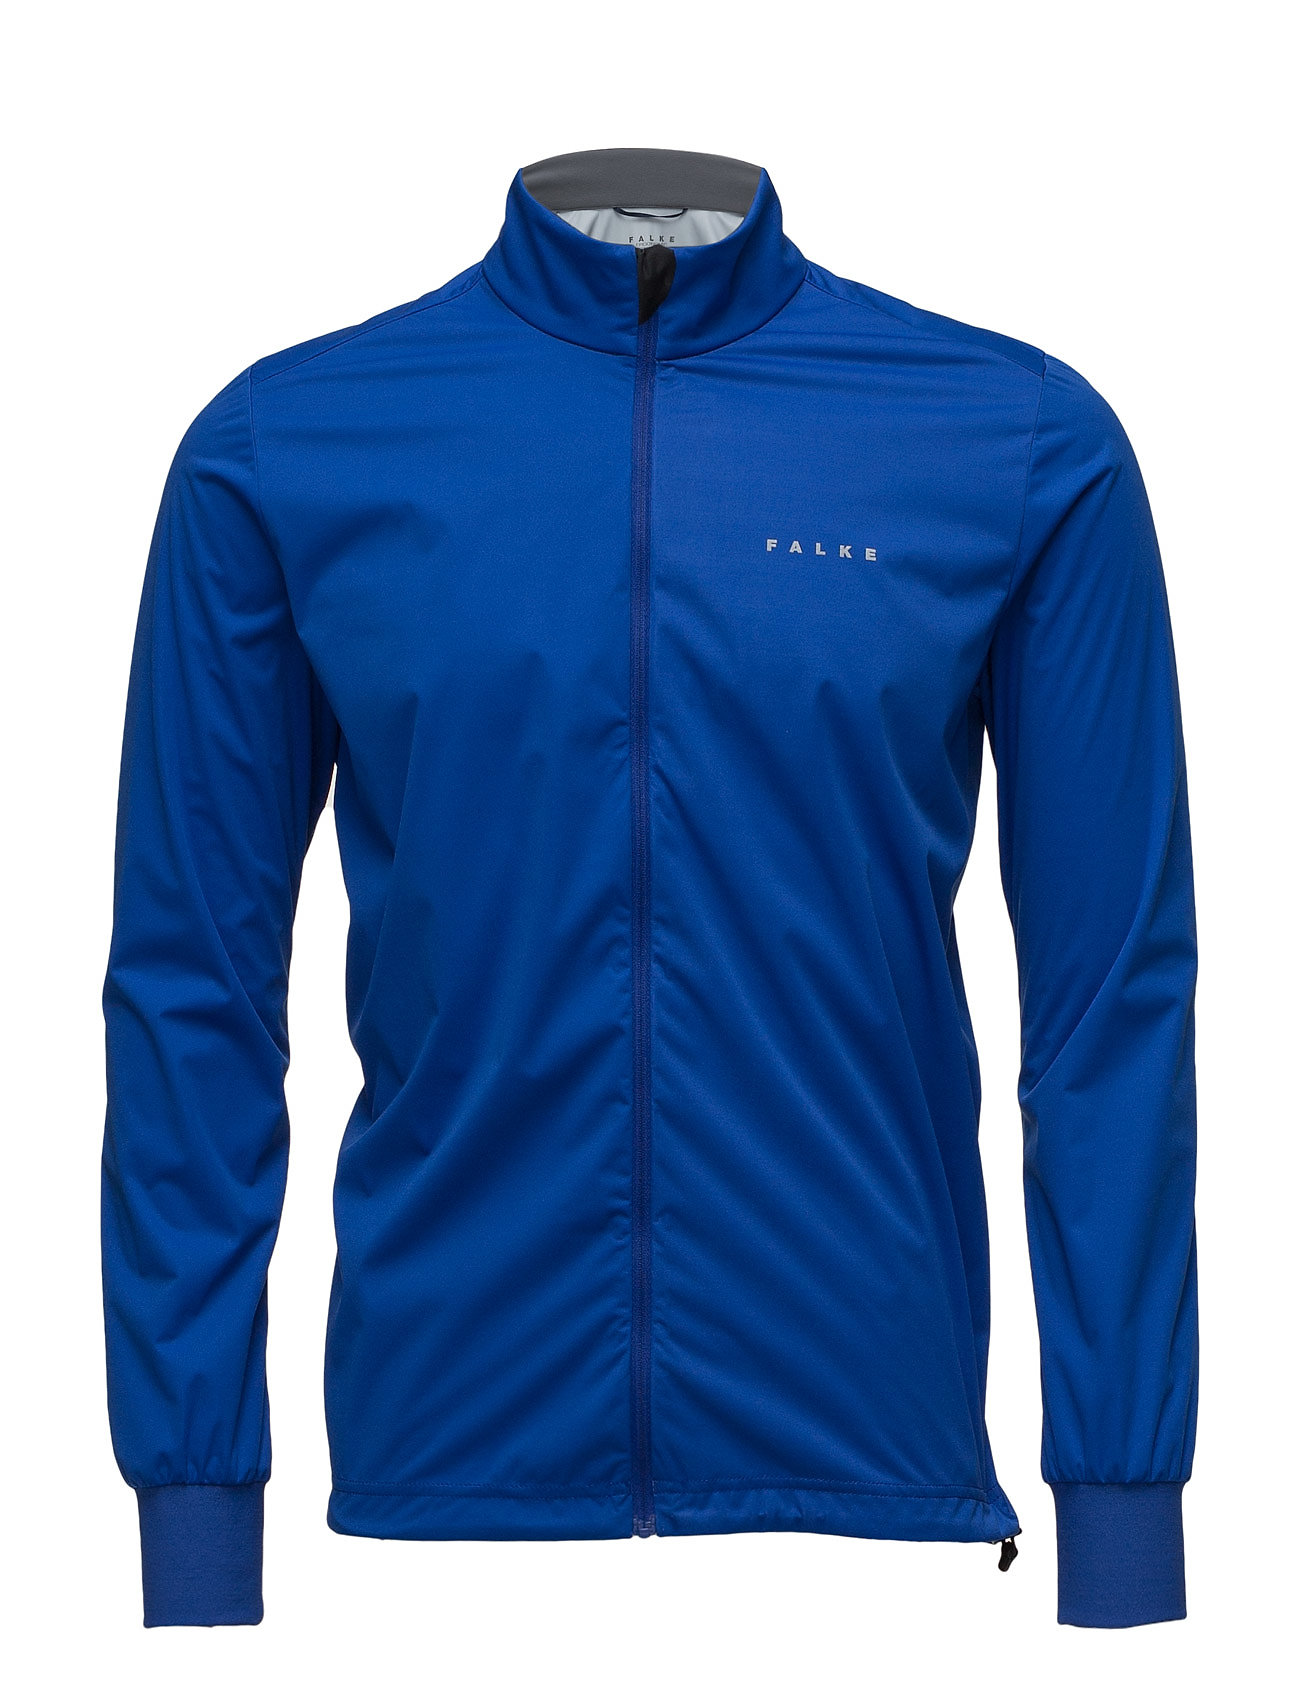 falke sport – Ru jacket wp m fra boozt.com dk